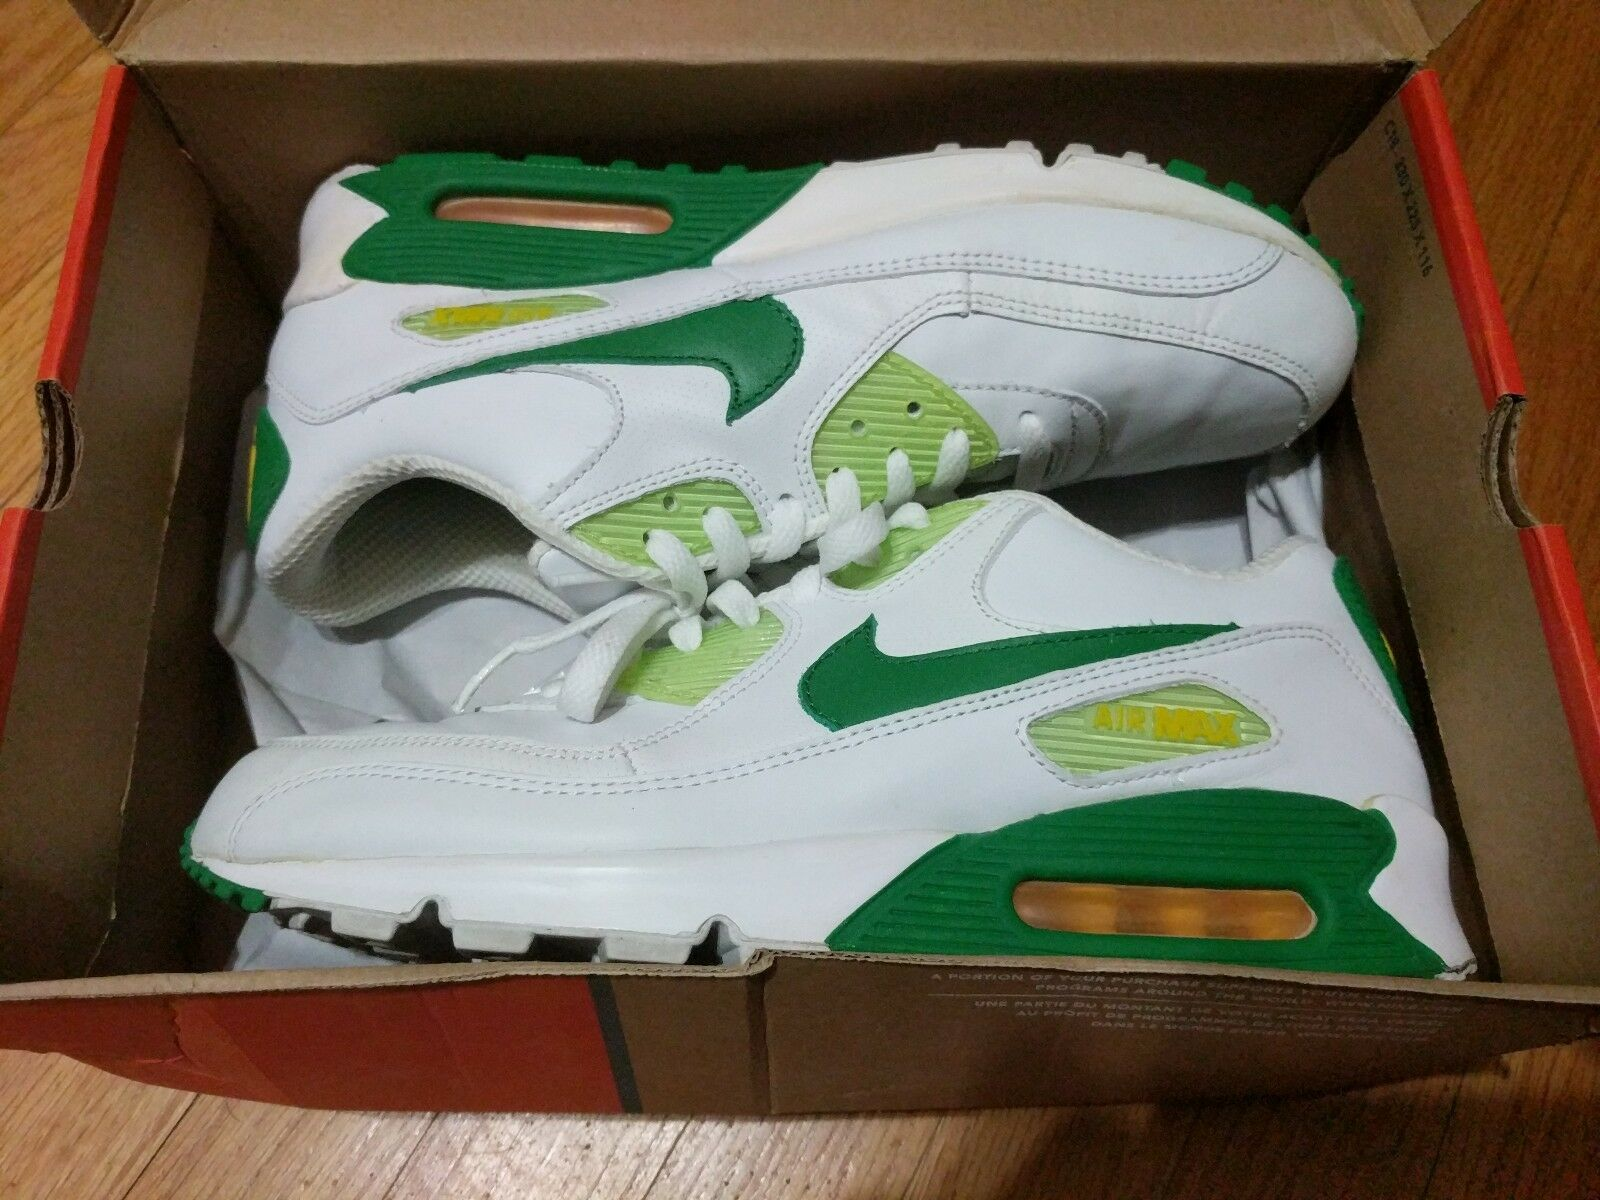 Nike AIR MAX 90 Size 10.5 White Green Yellow rare vintage near deadstock Oregon